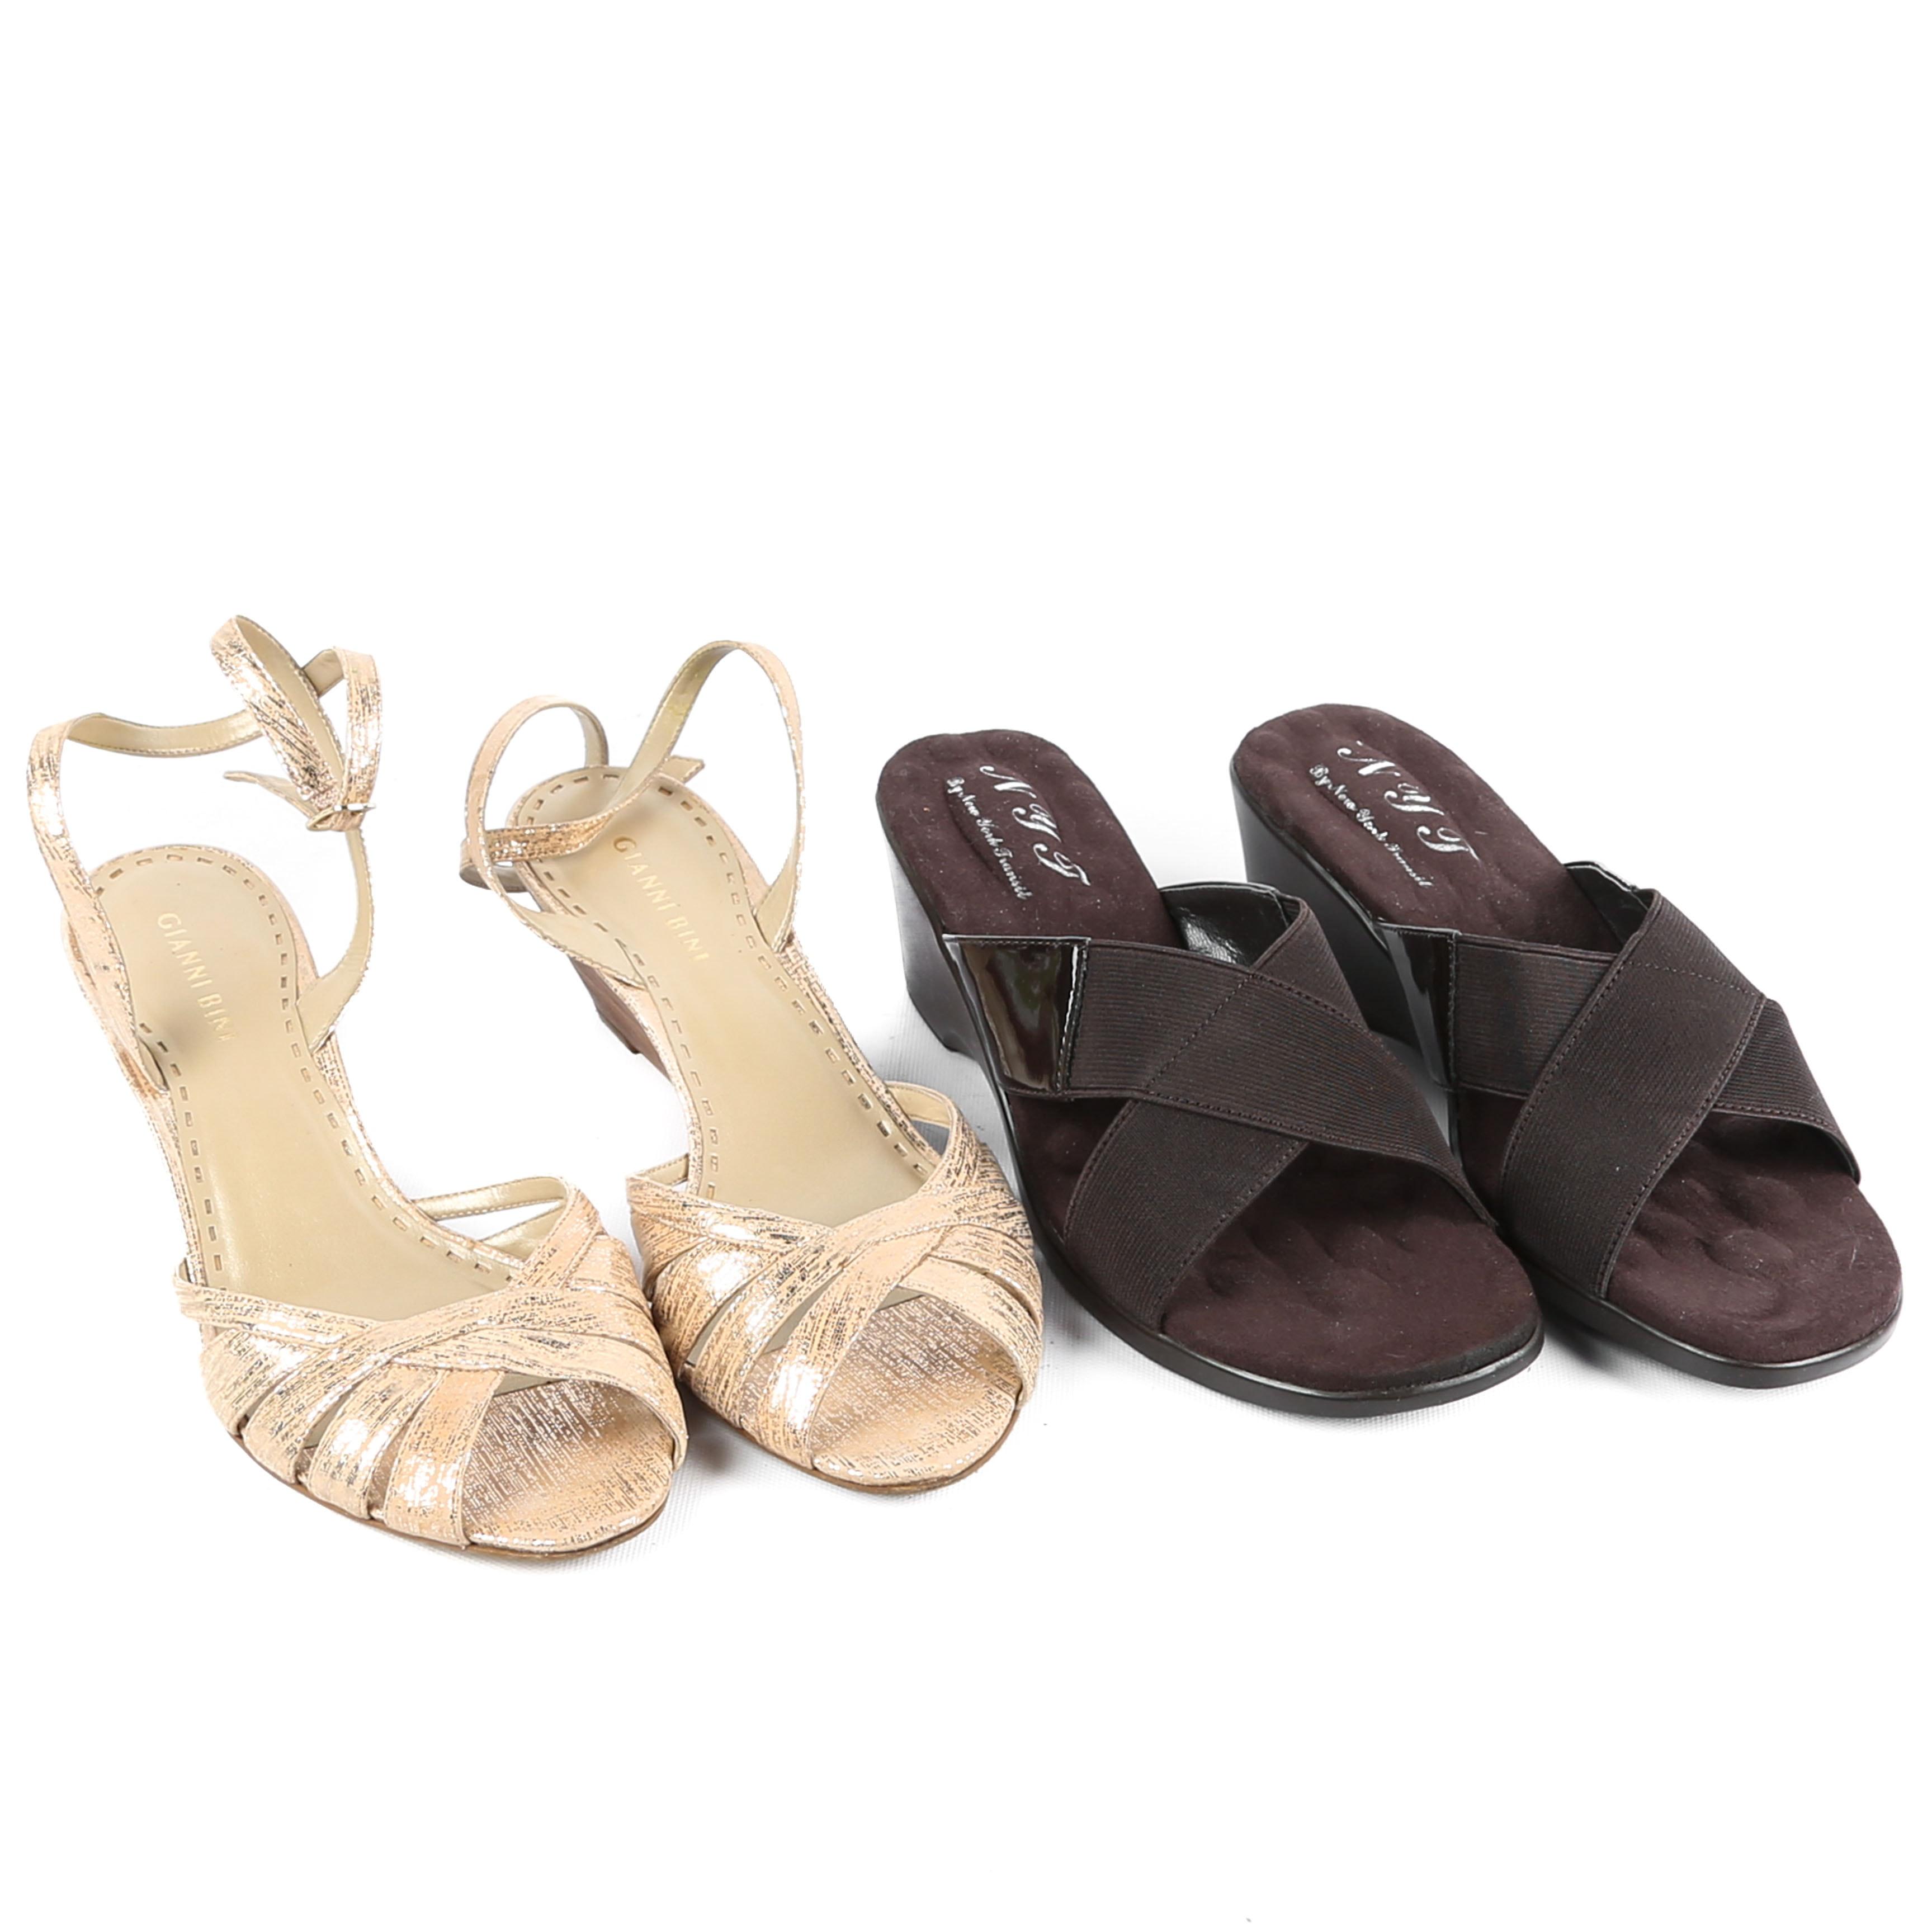 Women's Gianni Bini Dress Sandals and NYT Slide Sandals